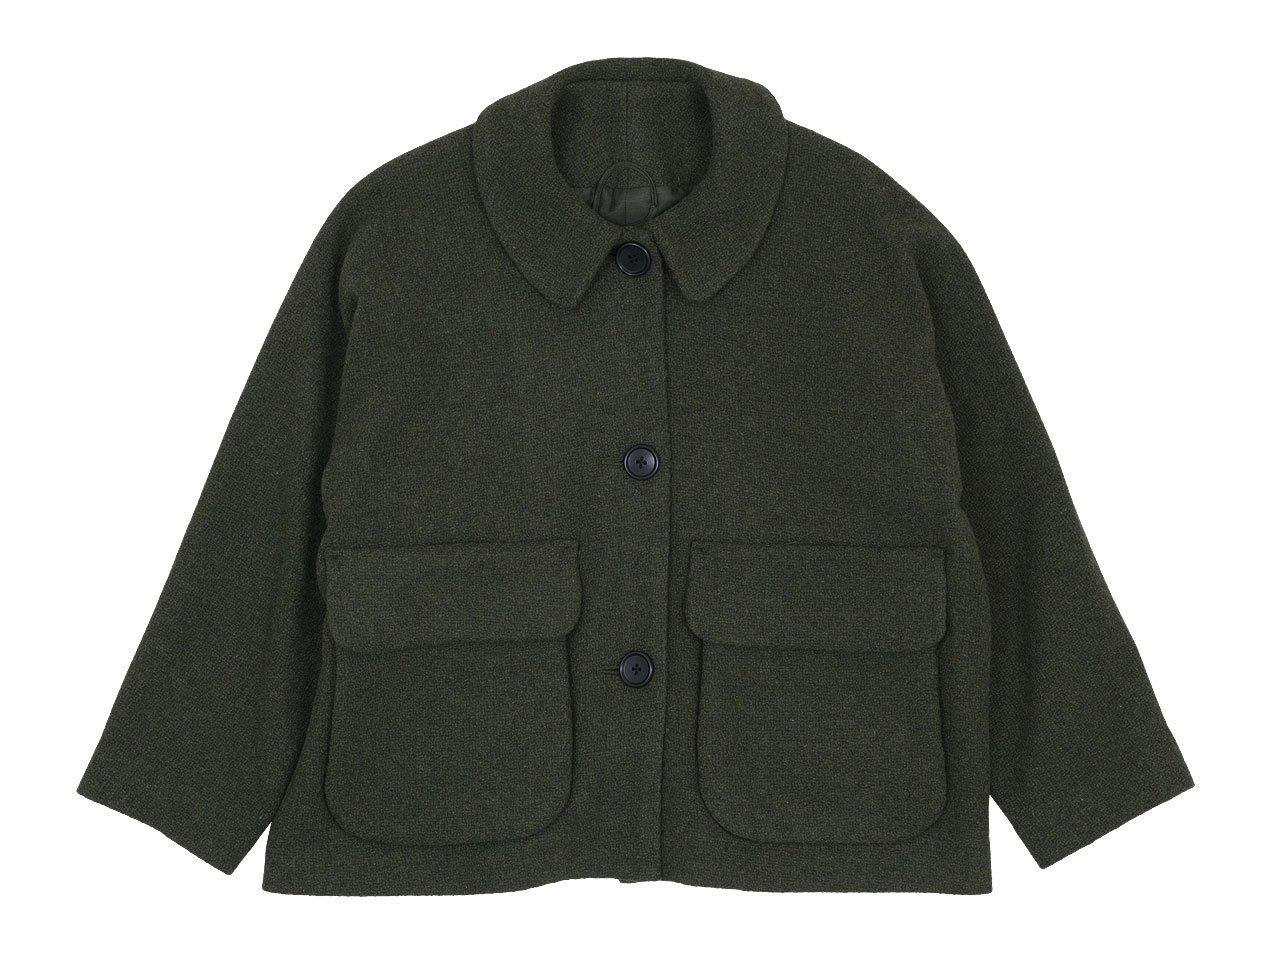 Atelier d'antan Clouet(クルーエ) Round Collar Wool Jacket OLIVE